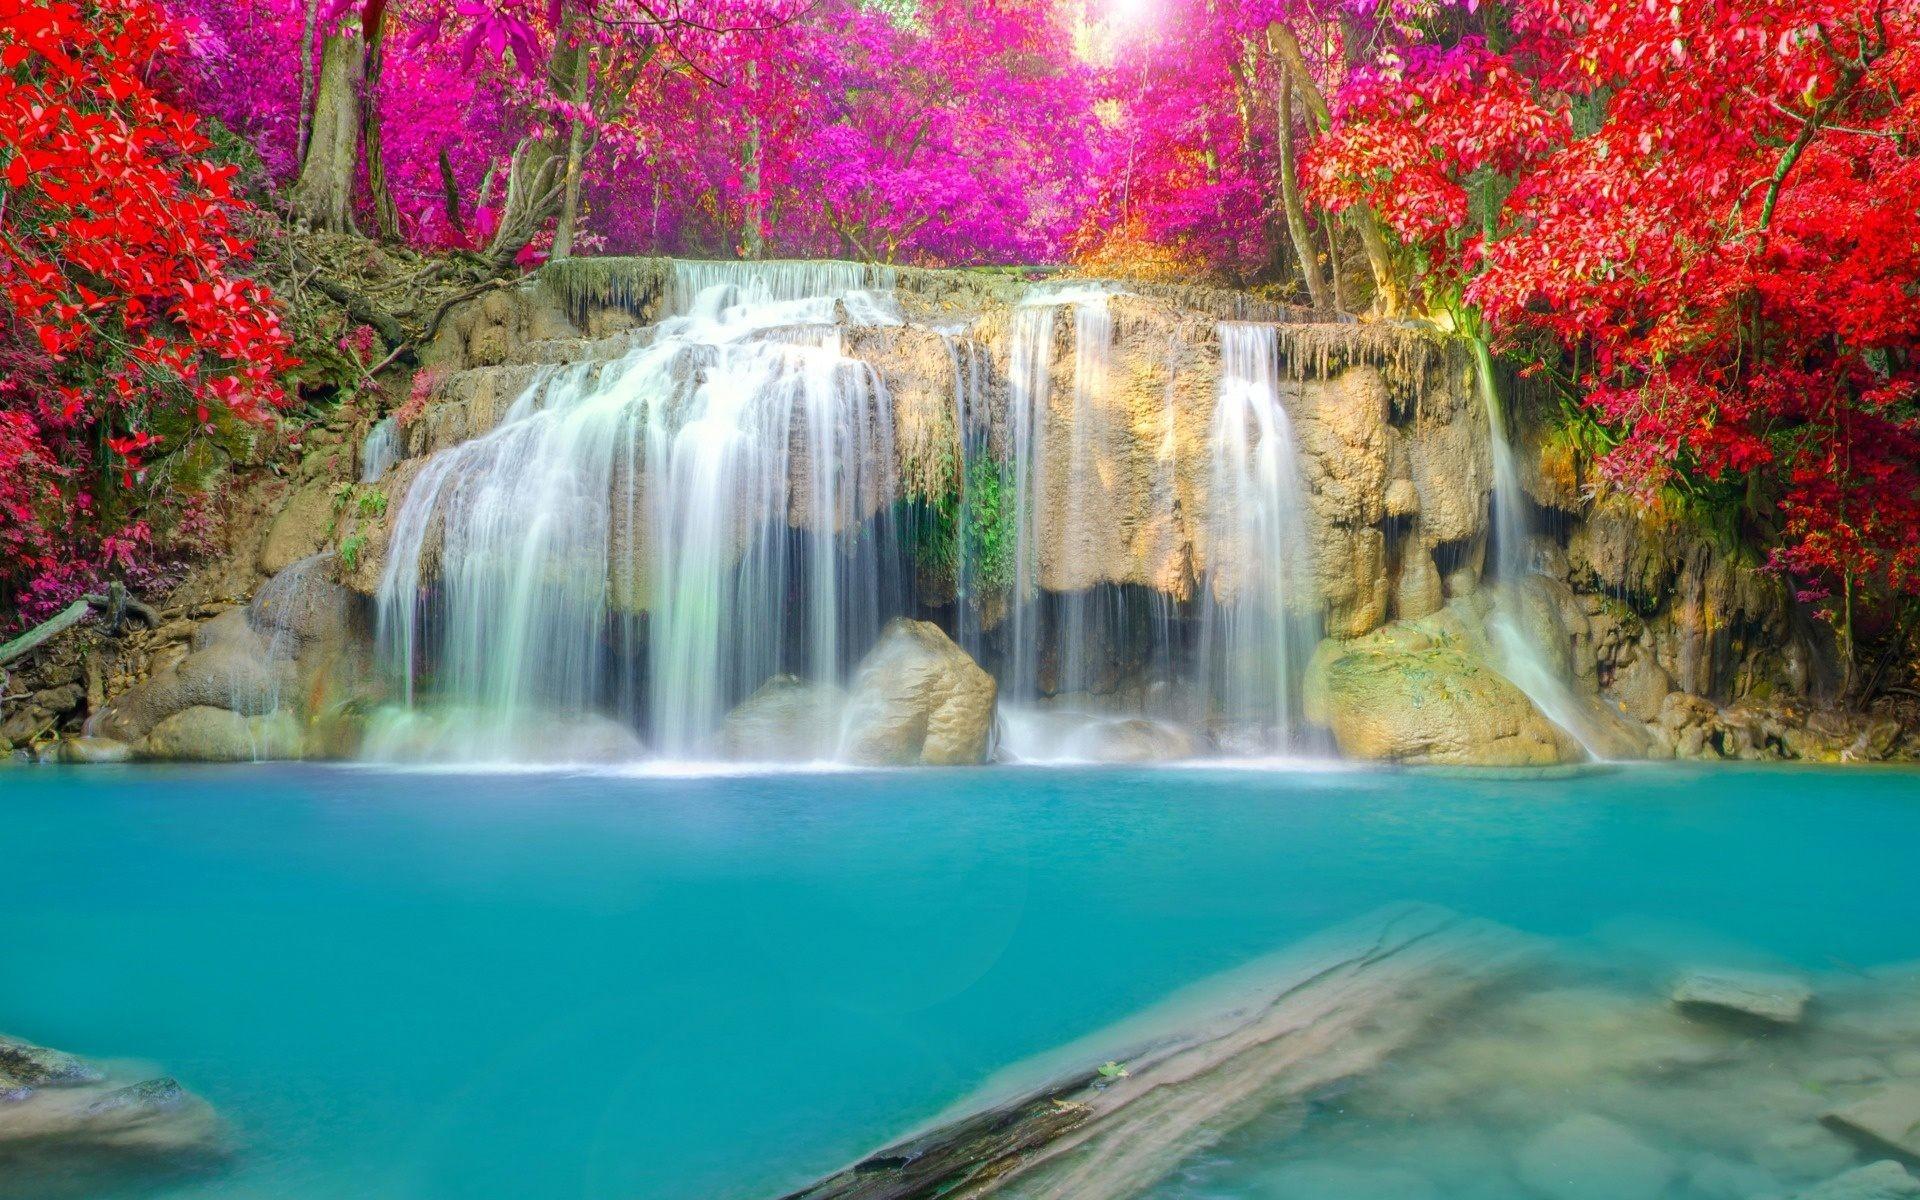 … jungle waterfall wallpaper for desktop laptop mobile …